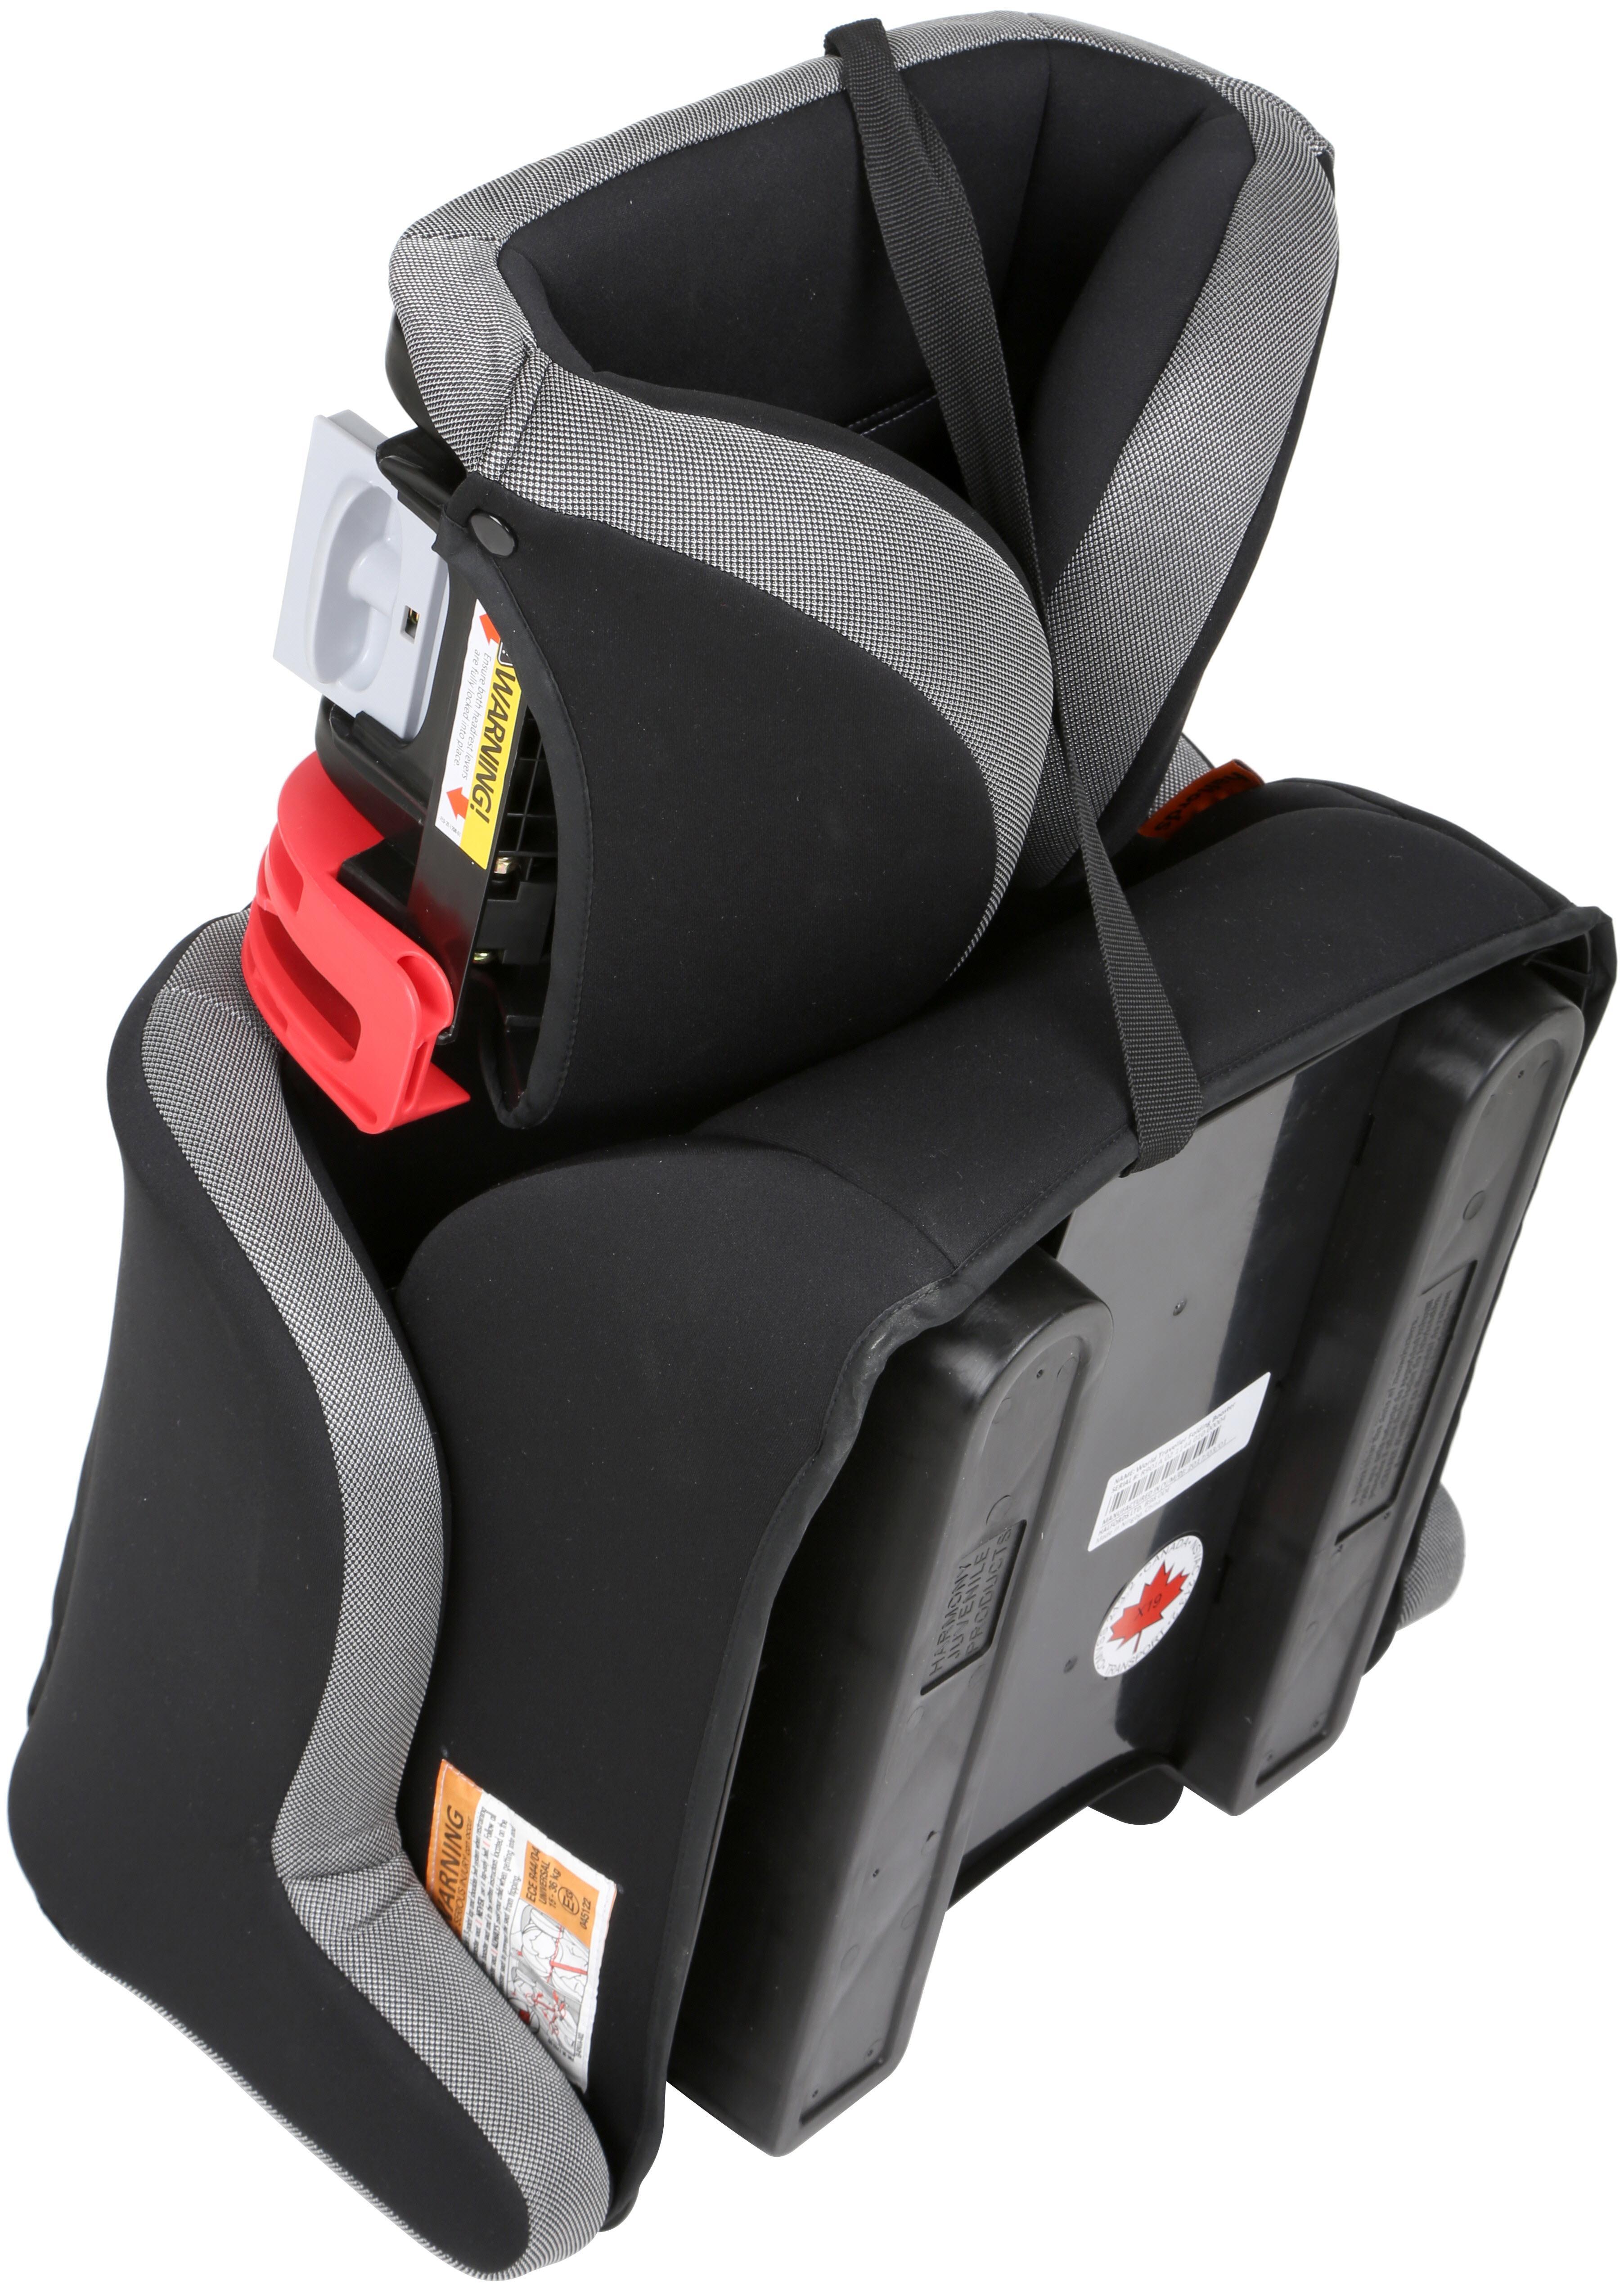 Halfords Kids Child Lightweight Travel Protector Folding